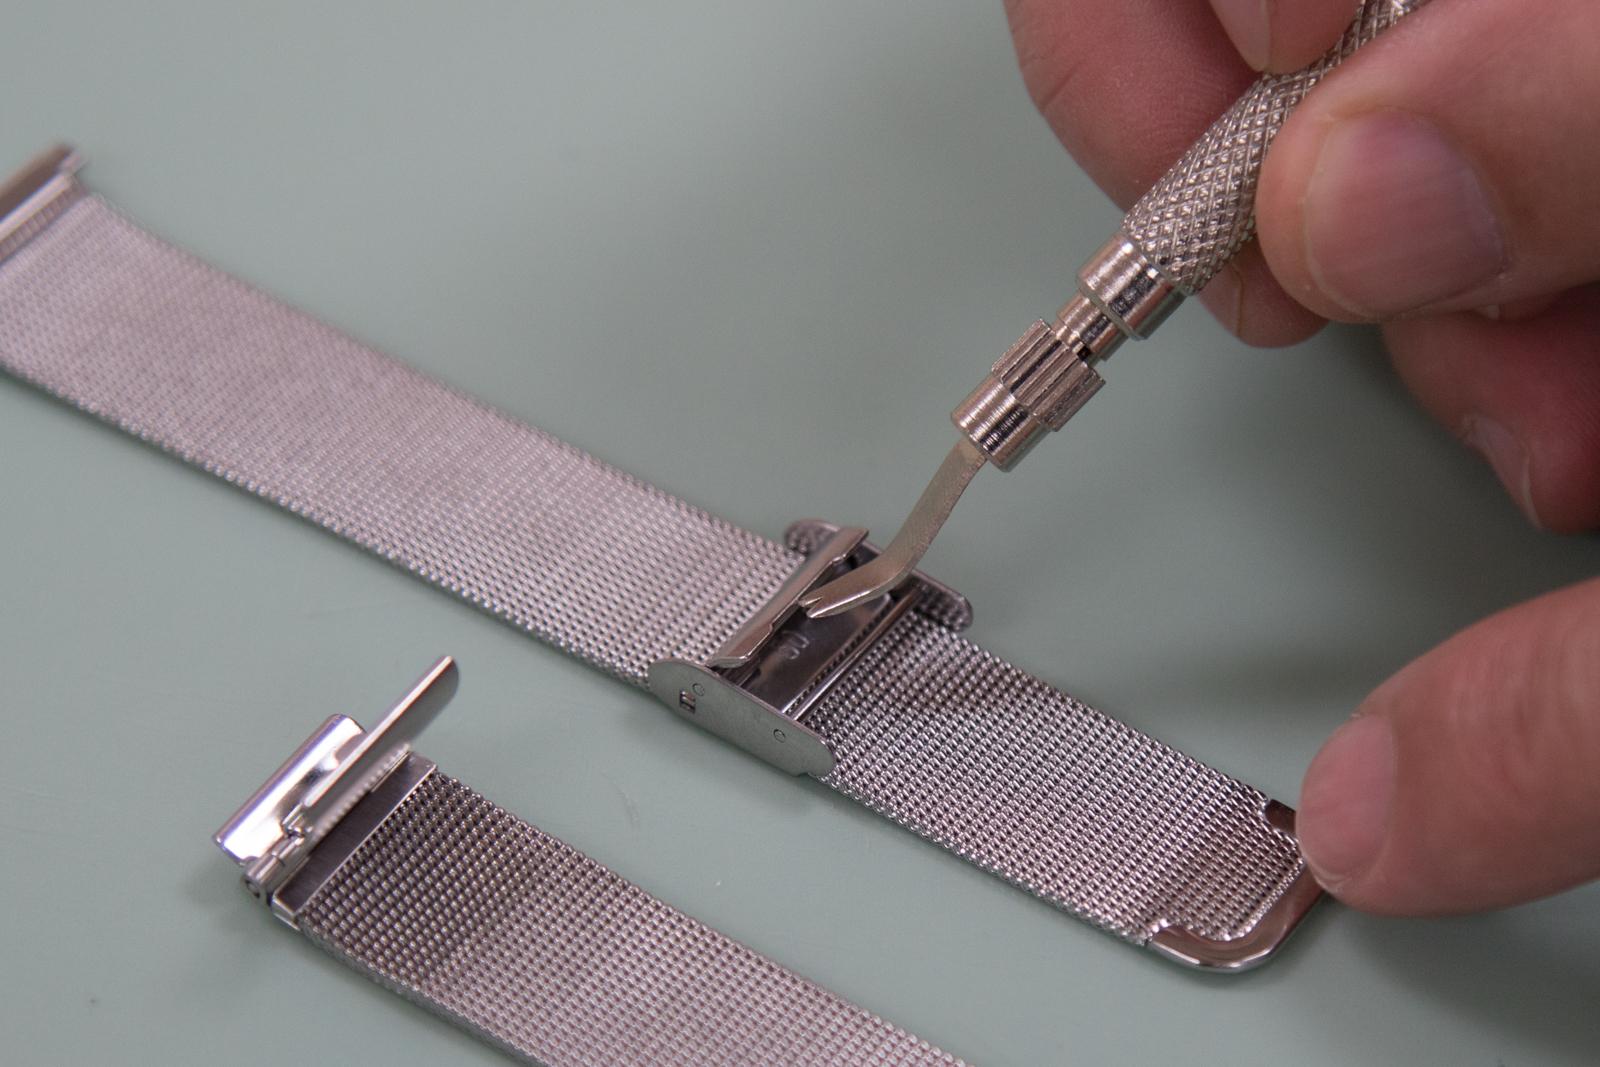 f82b69bf563 Adjust Mesh Style Metal Watch Bands - Shorten Mesh Watch Bands ...